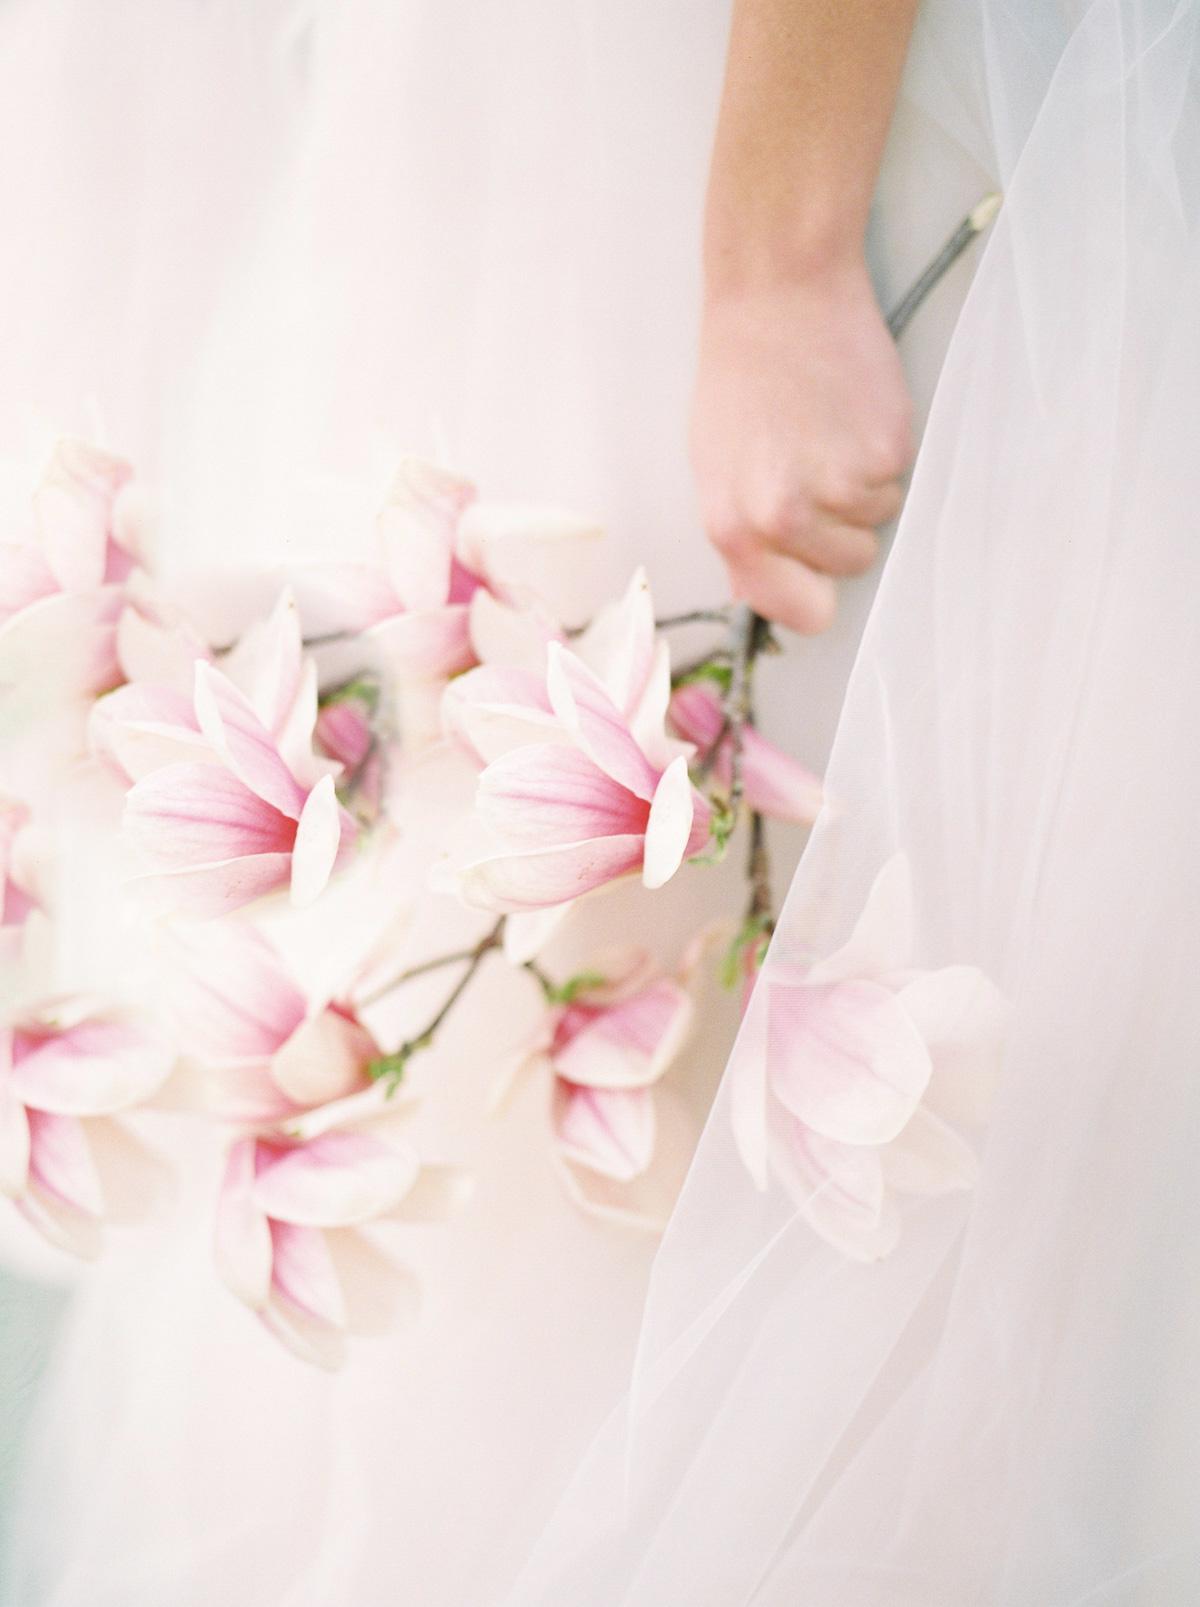 julia-park-photography-vineyard-bride-swish-list-niagara-on-the-lake-wedding-editorial-36.jpg